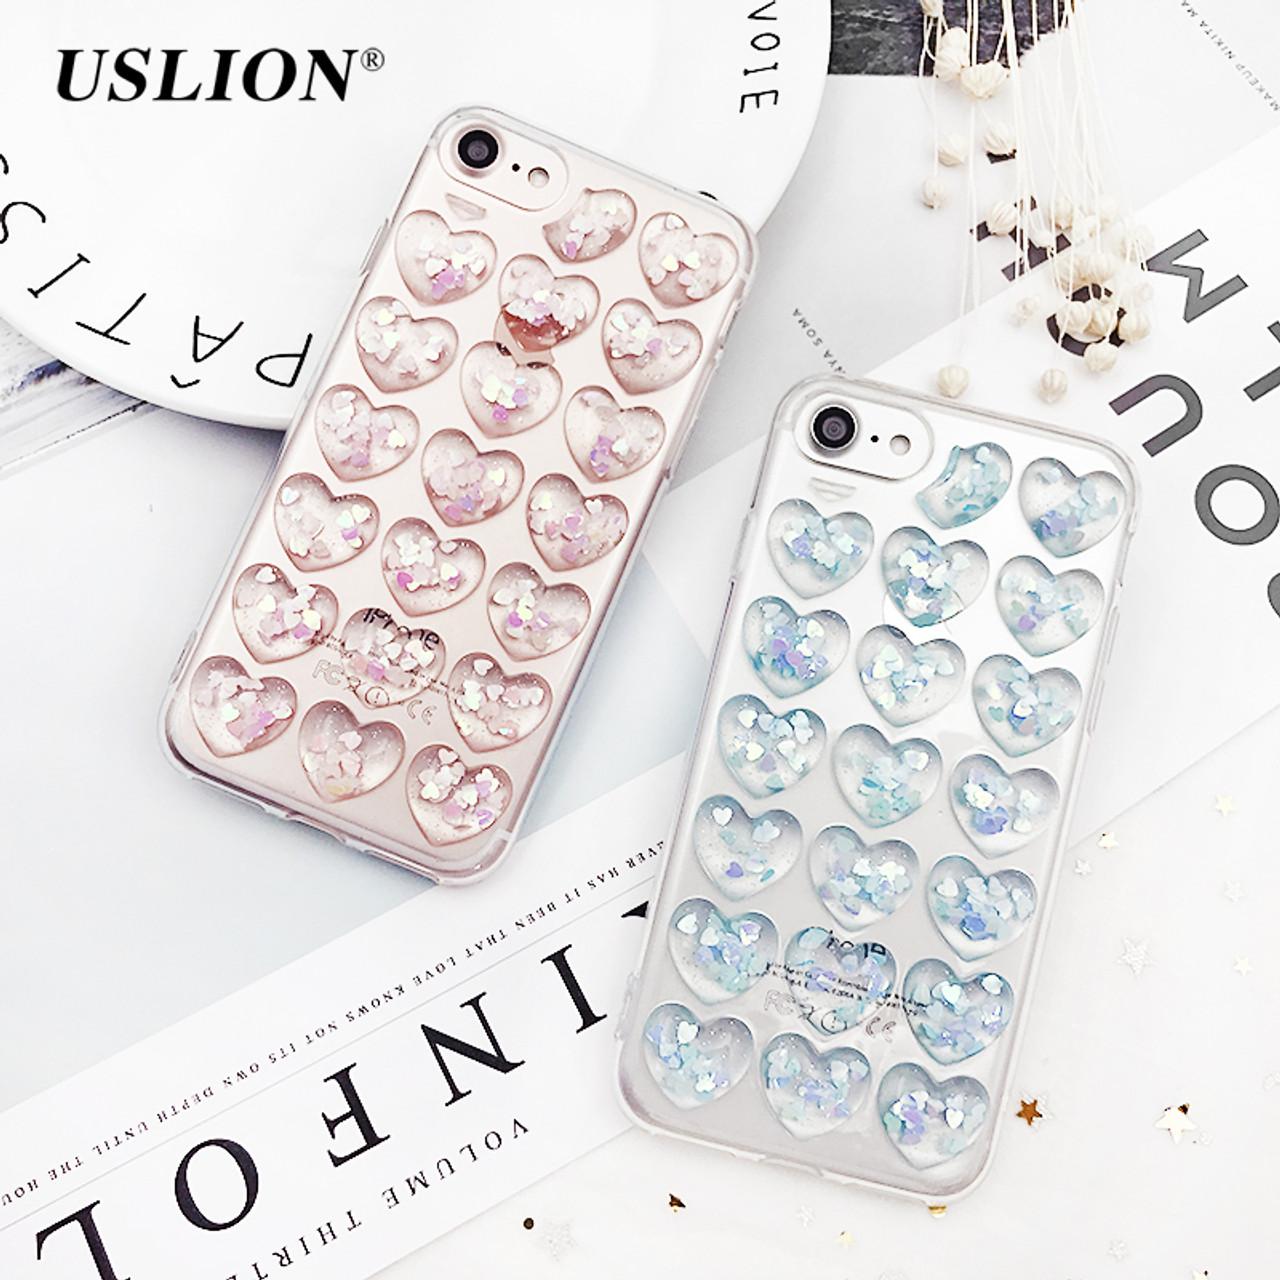 5b90fadf96 USLION Glitter 3D Love Heart Phone Case For iPhone 7 Plus Transparent Cases  Soft TPU Clear ...